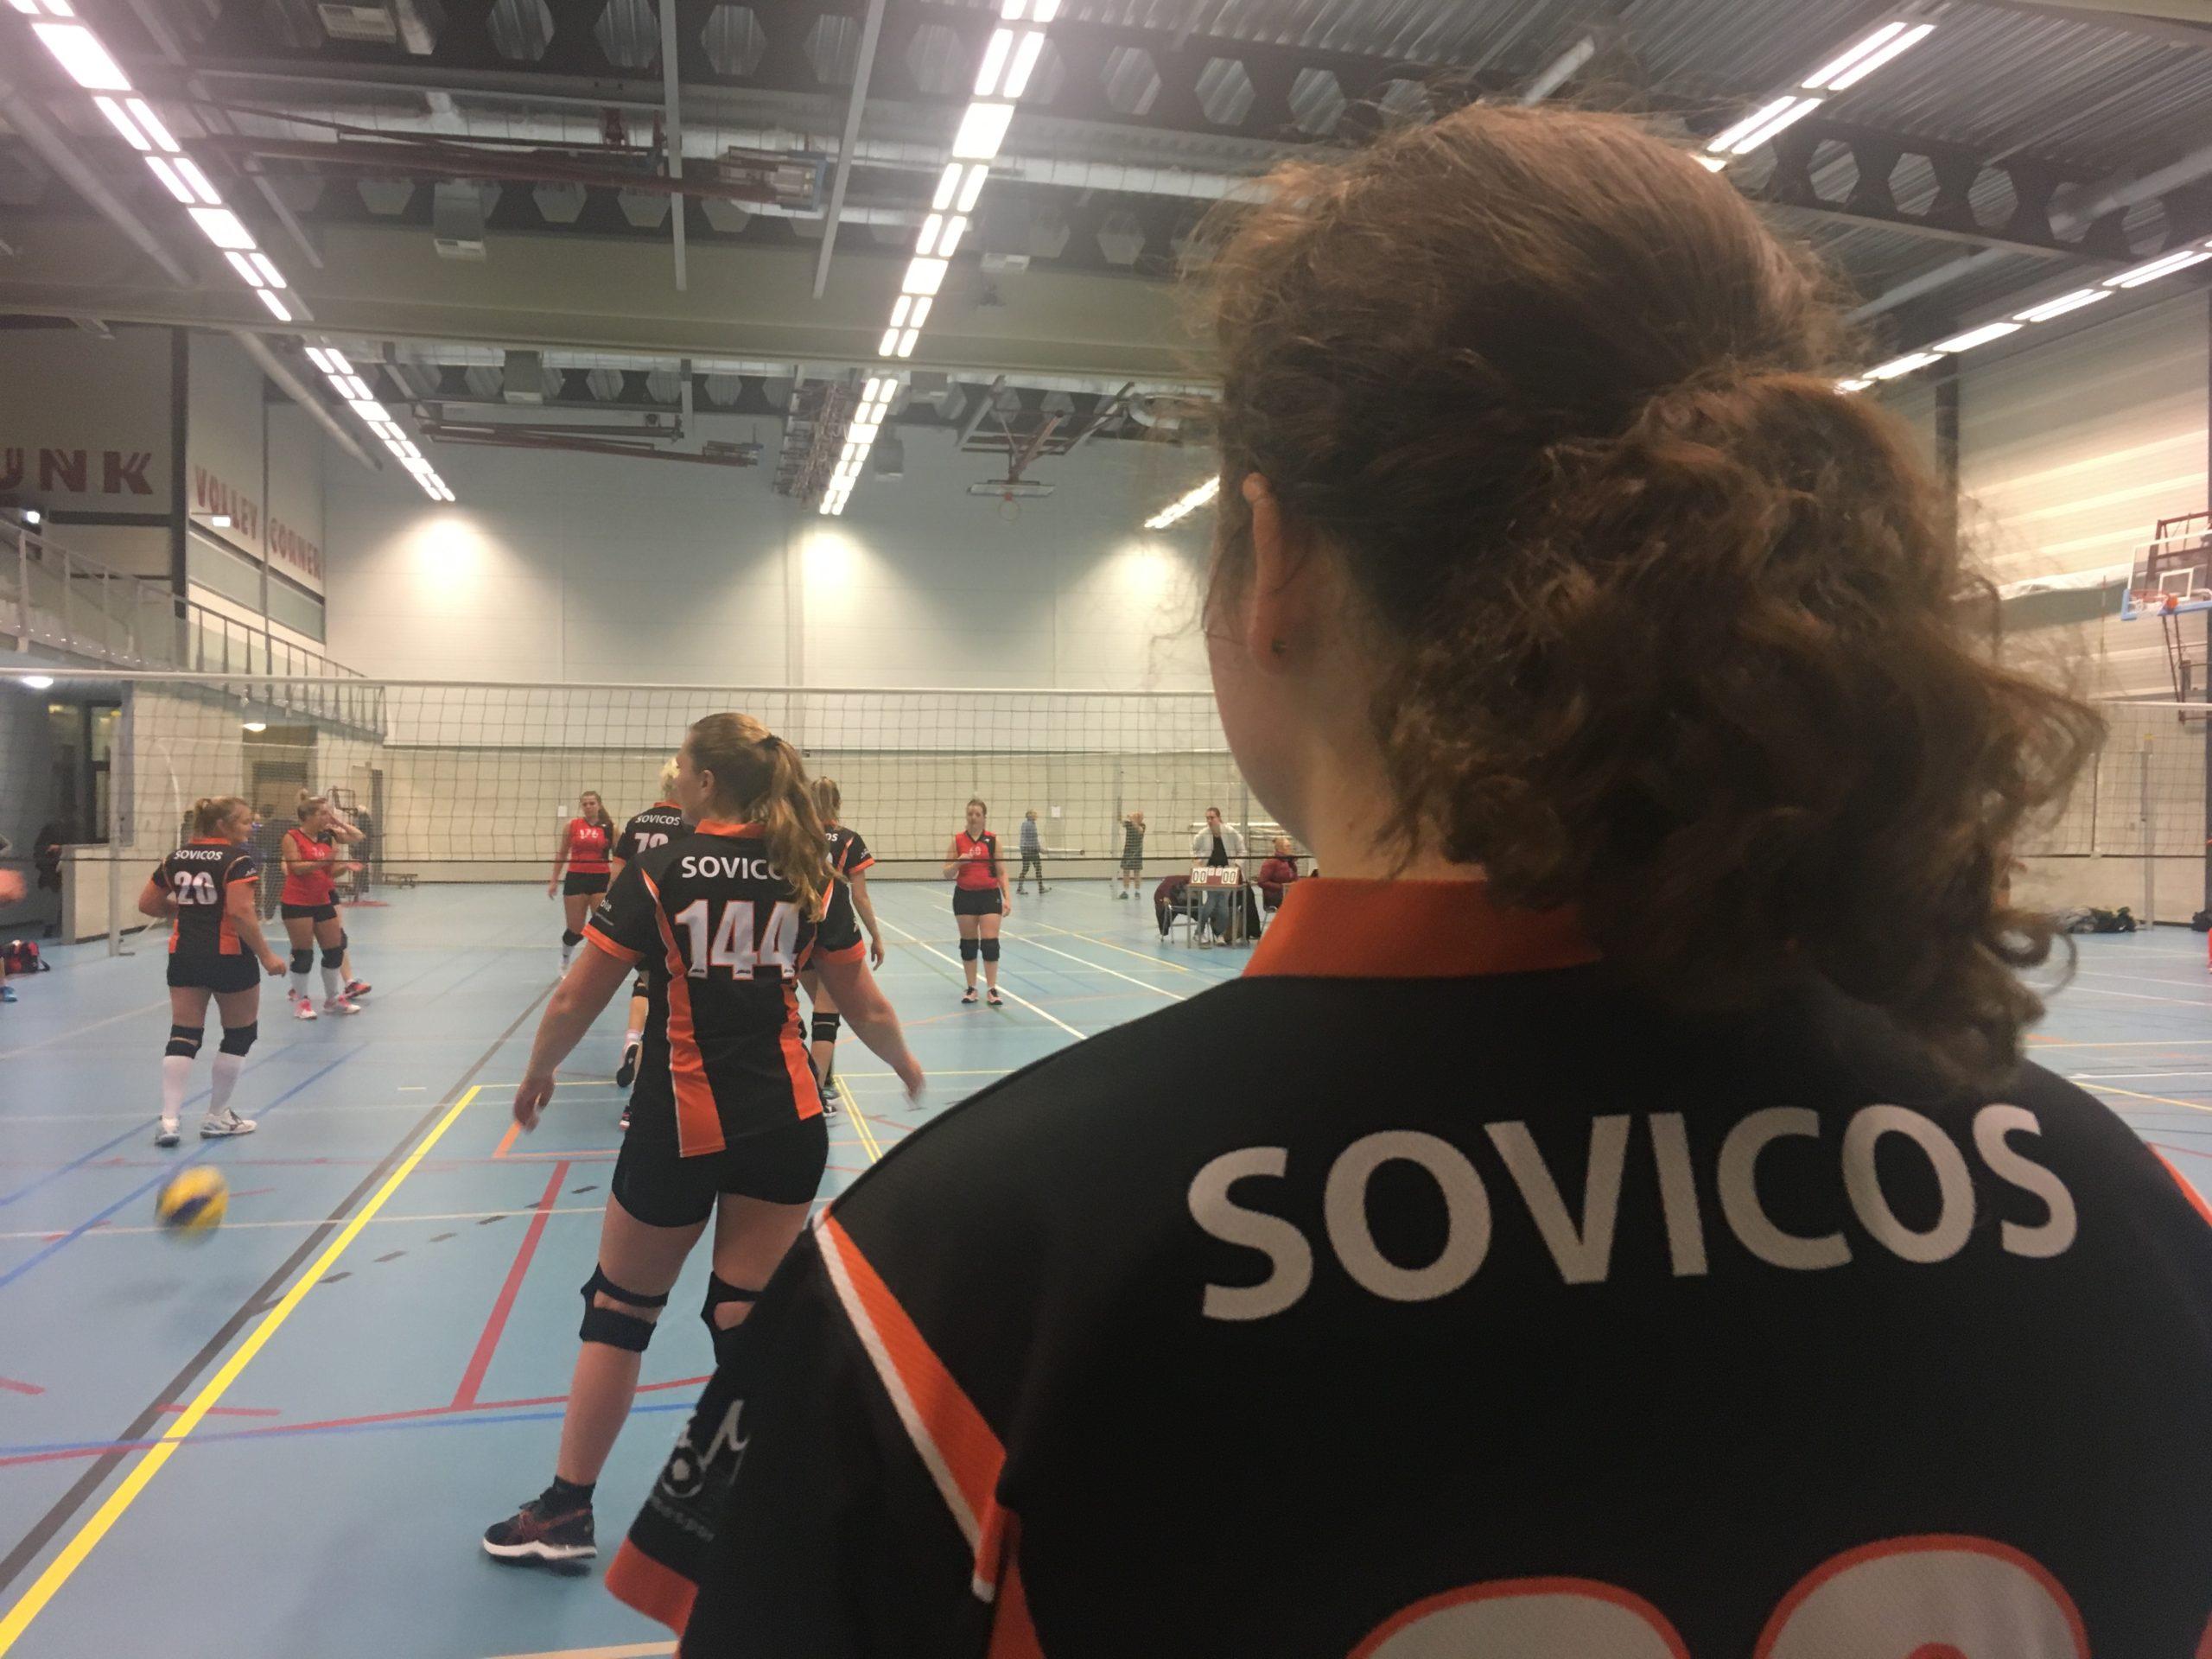 Haagse derby: Kalinko D6 vs Sovicos D3